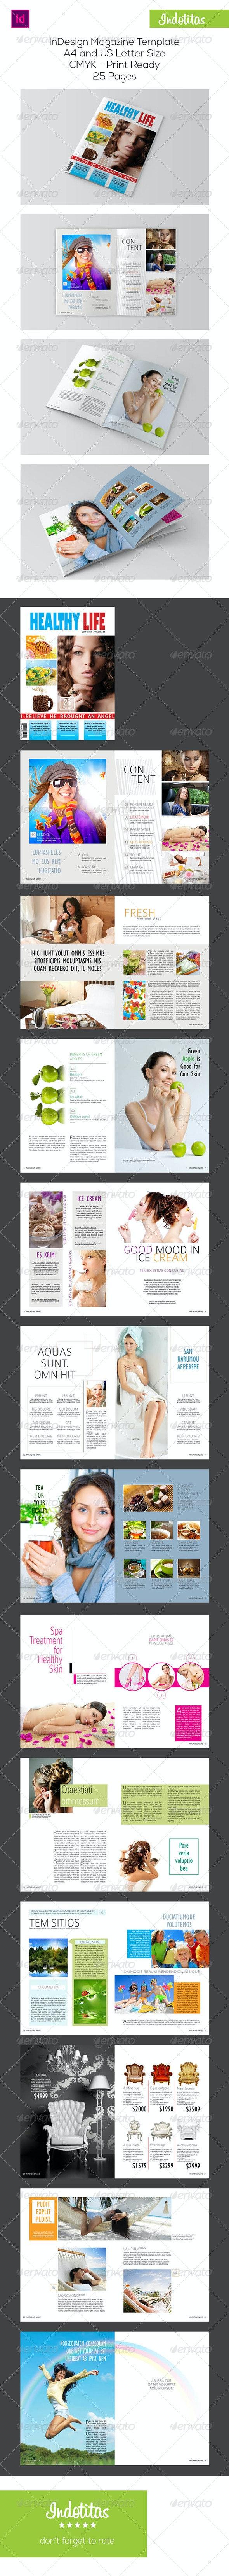 Healthy Life Magazine Template - Magazines Print Templates